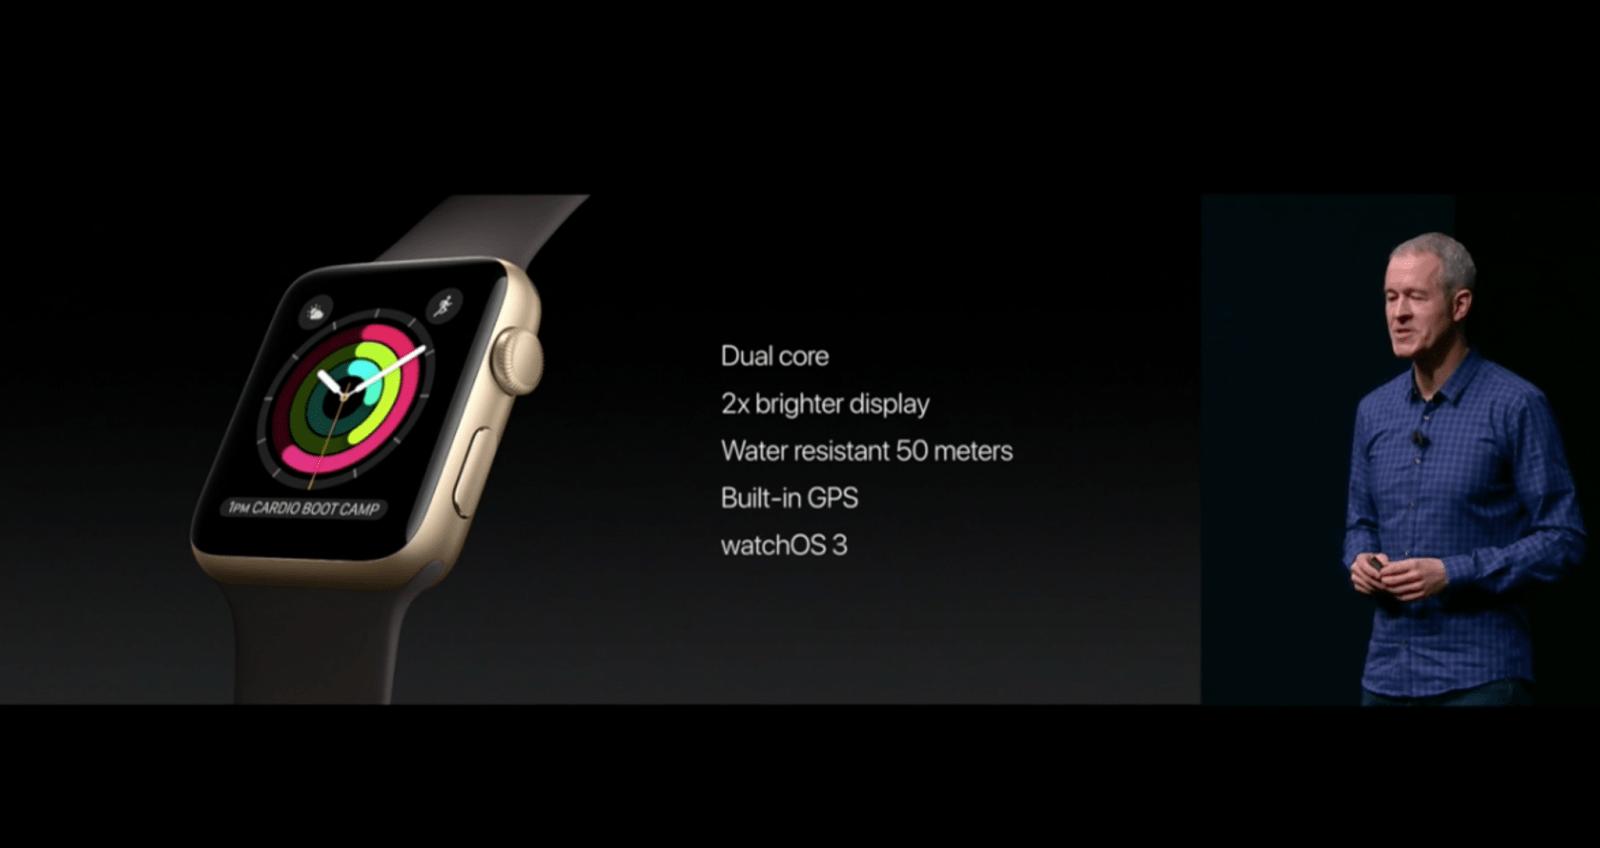 Nowy APPLE Watch jest faktem – co nowego w Apple Watch Series 2?